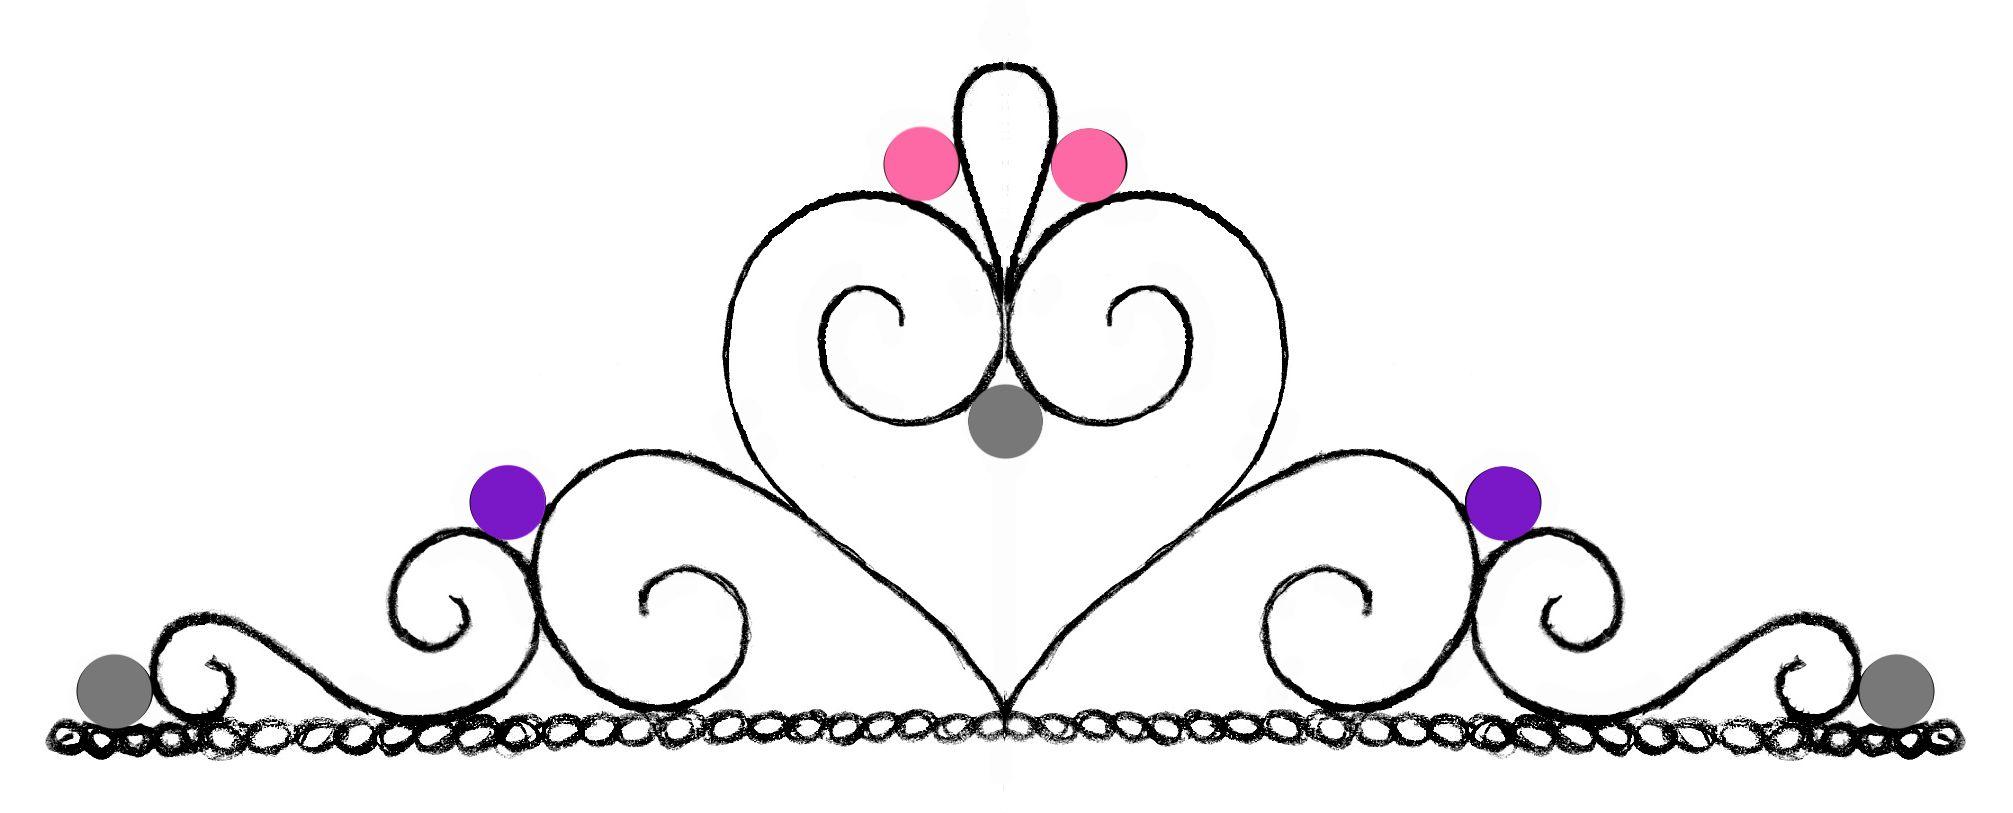 Tiara for Princess Cupcakes - See Princess Cupcakes in the Cupcake ...